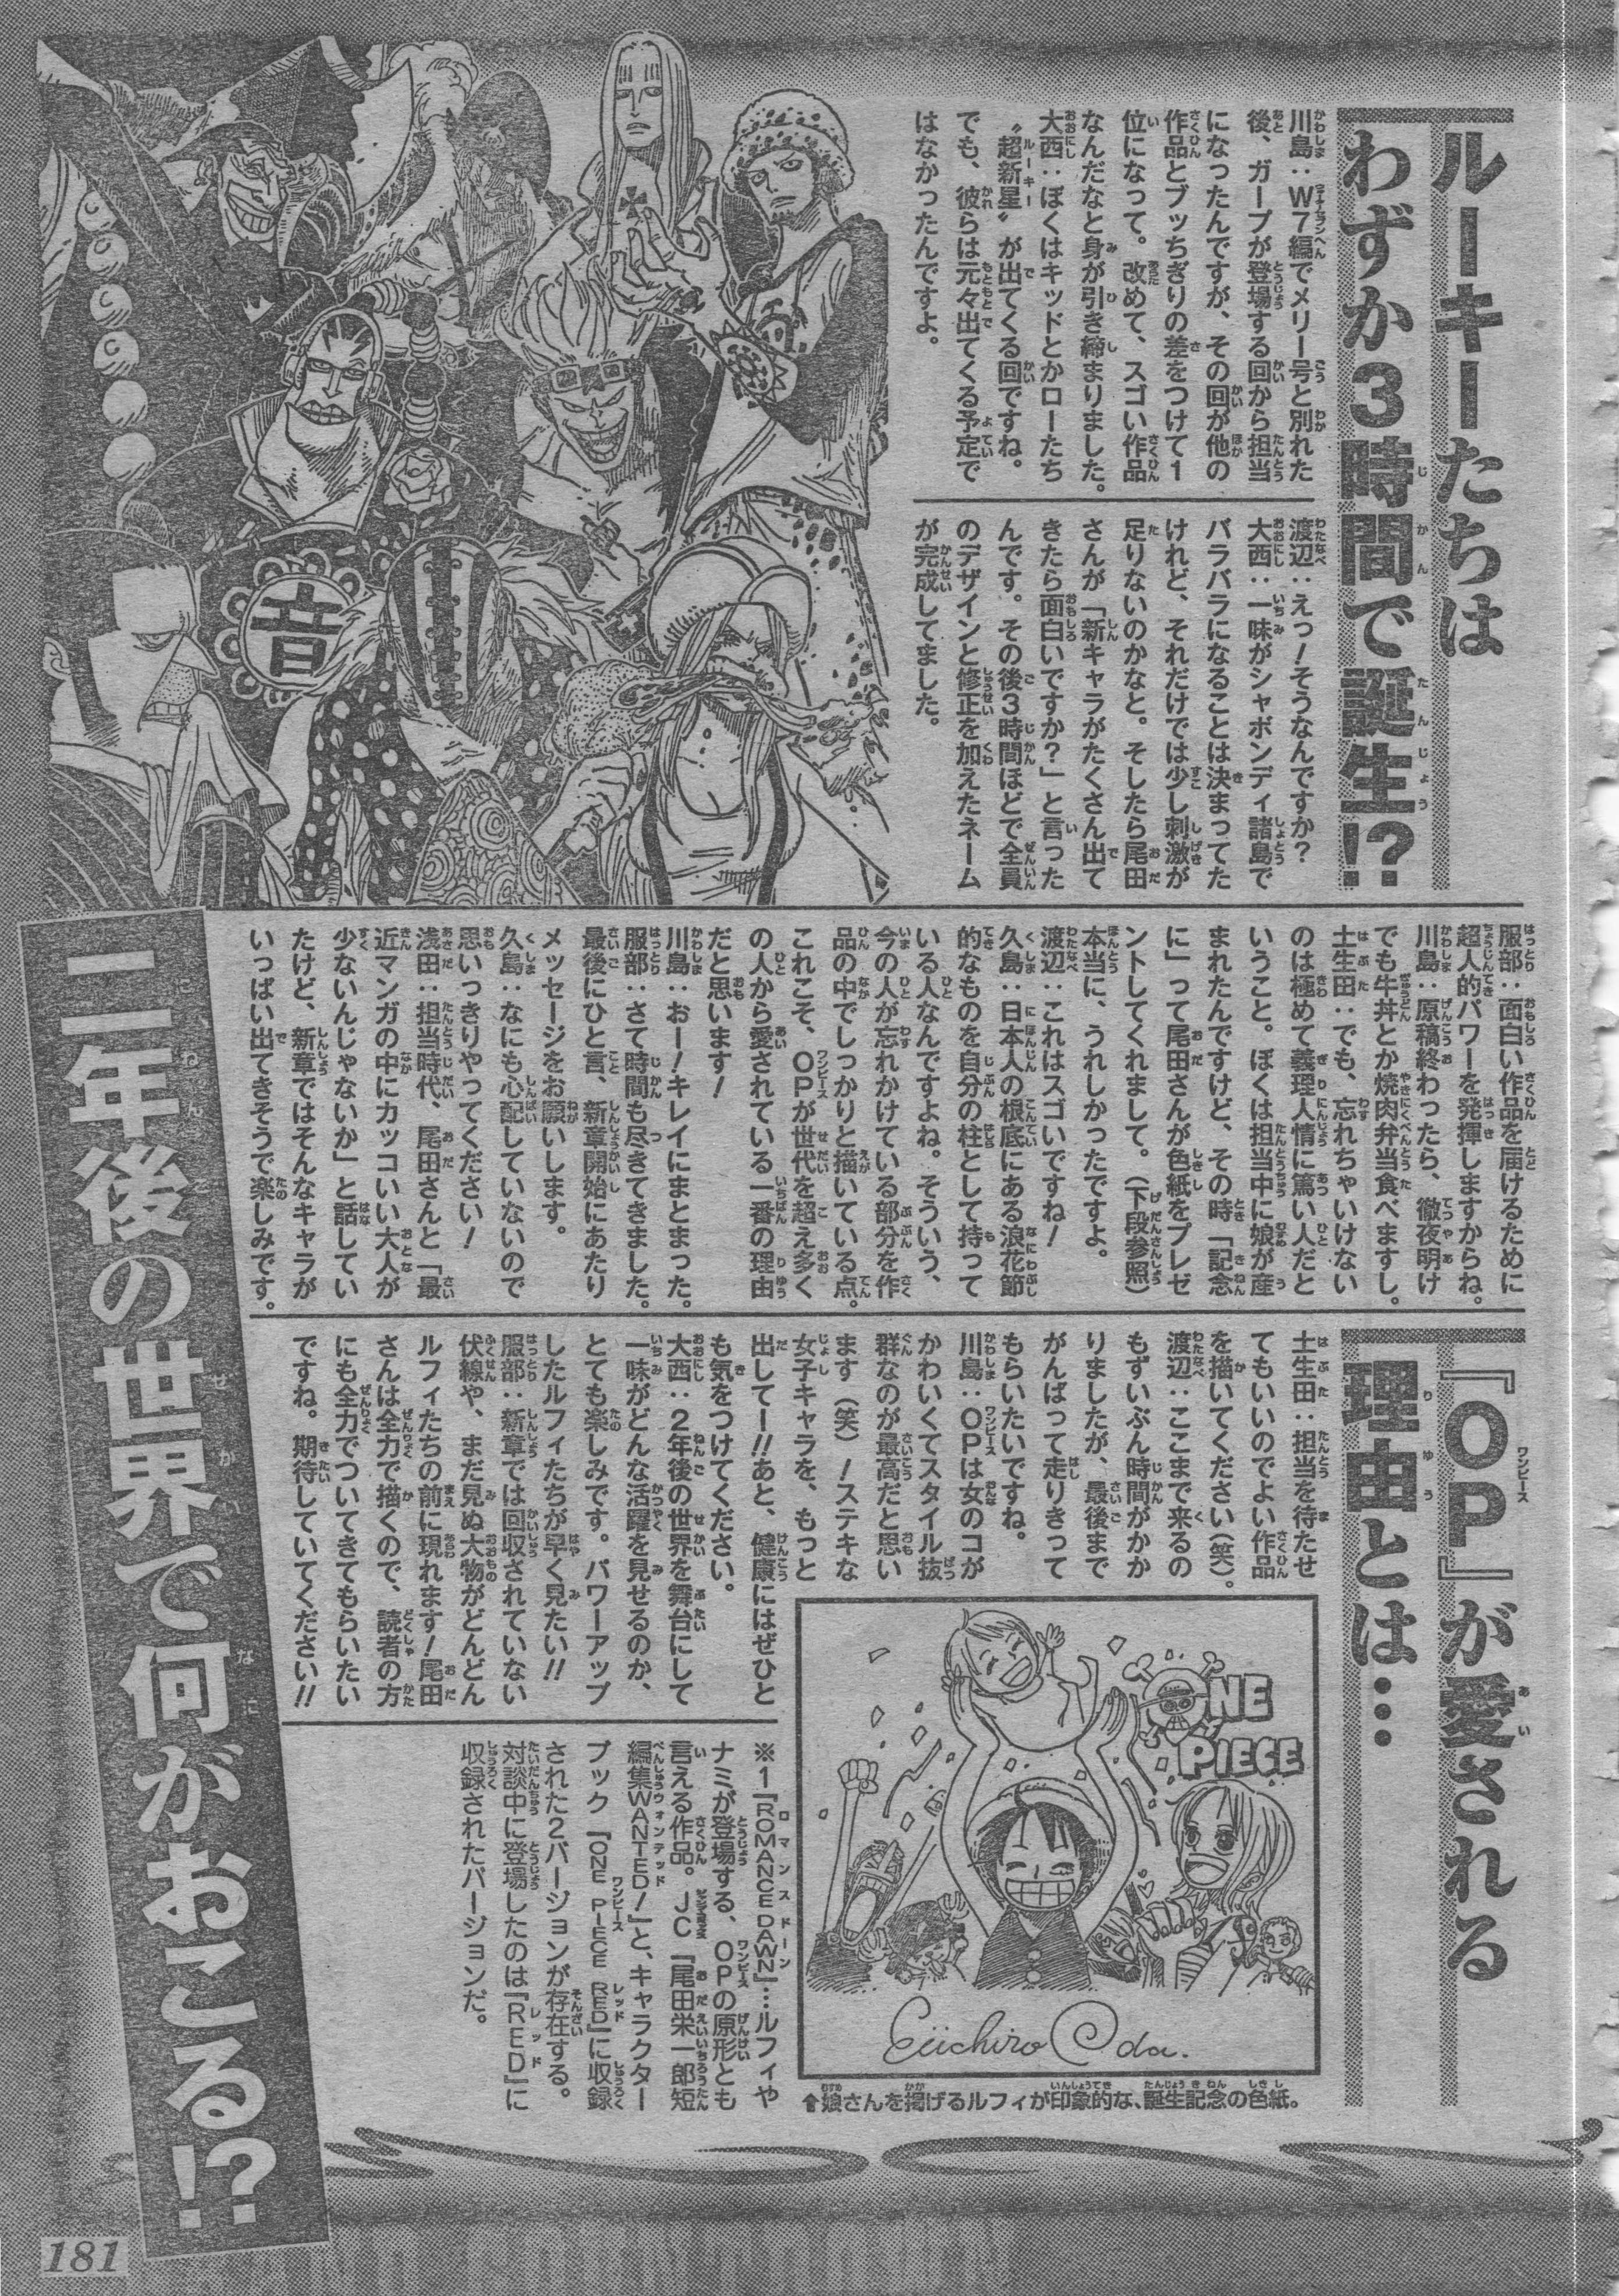 Relations dans l'équipage de mugiwara no luffy - Page 5 05